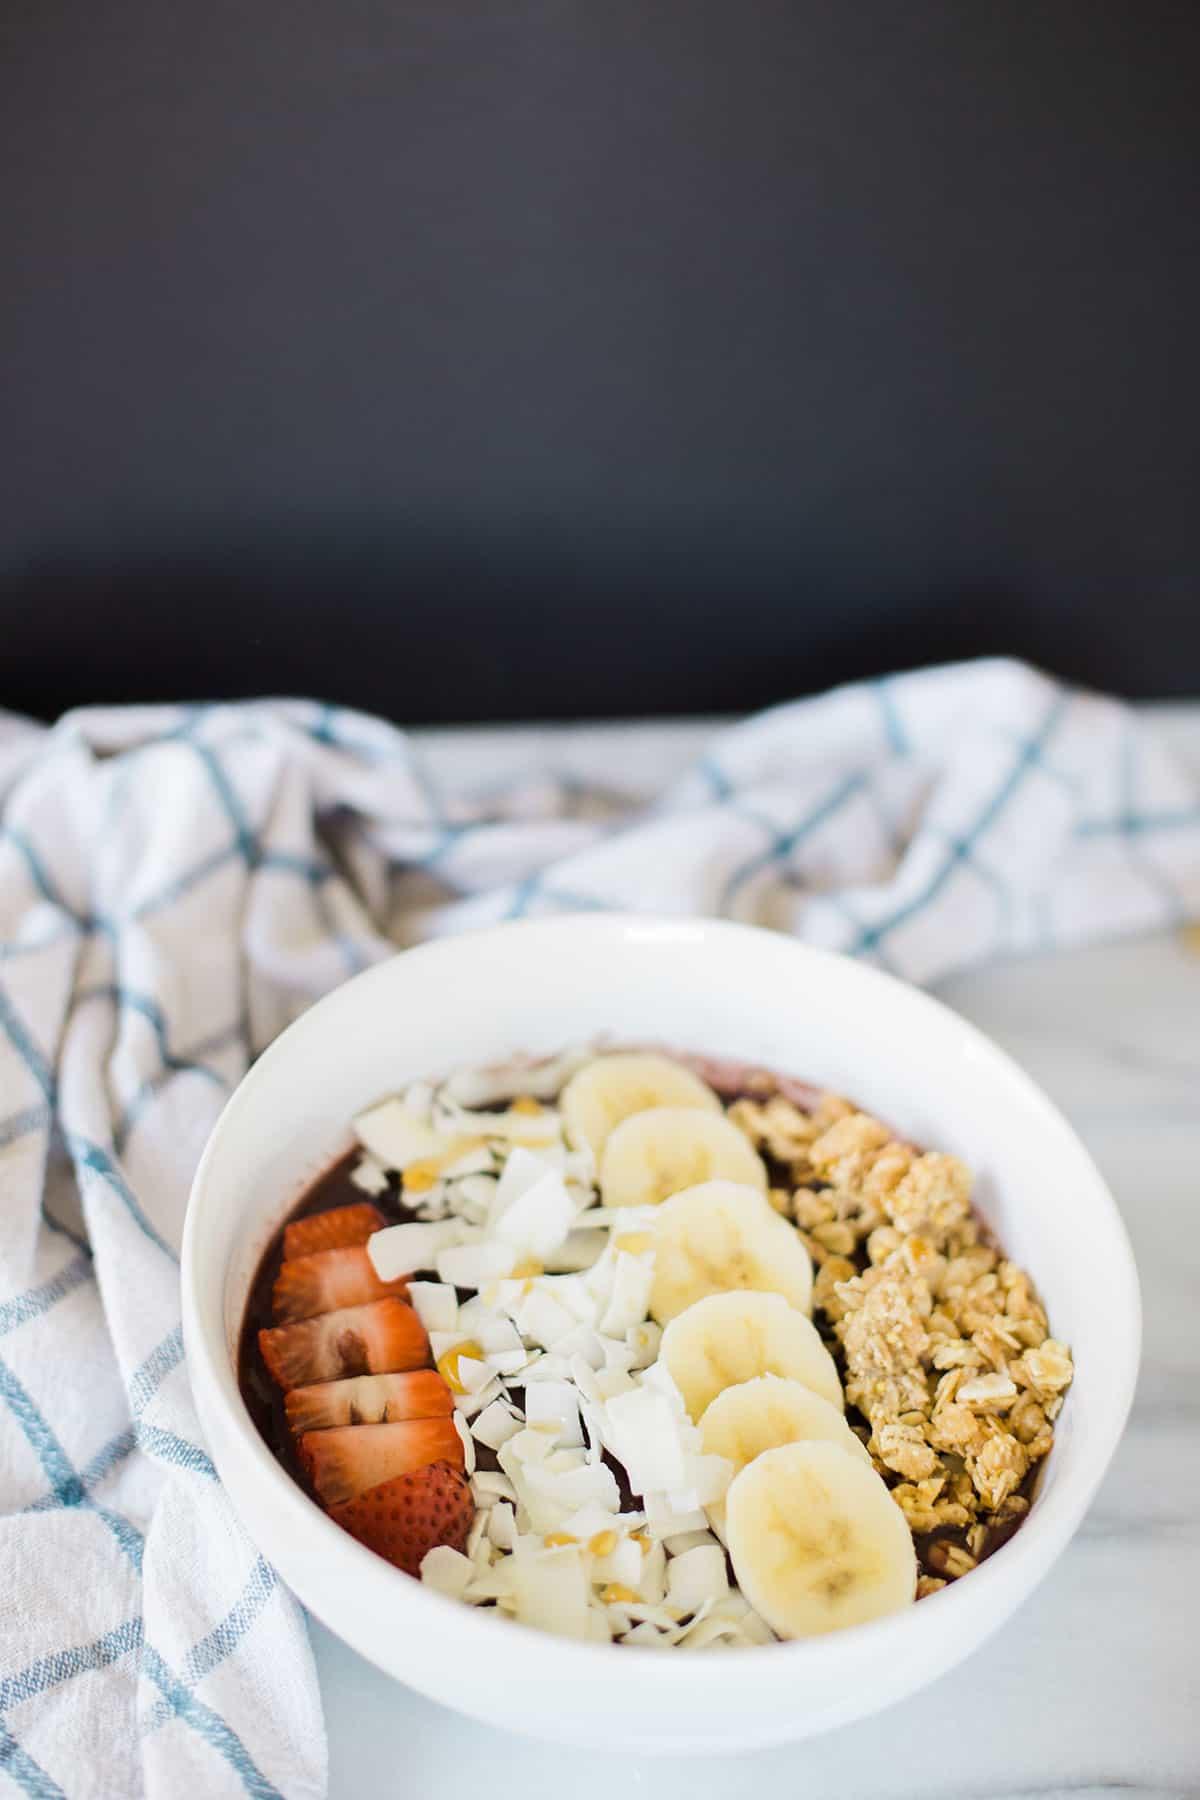 peanut butter acai bowl